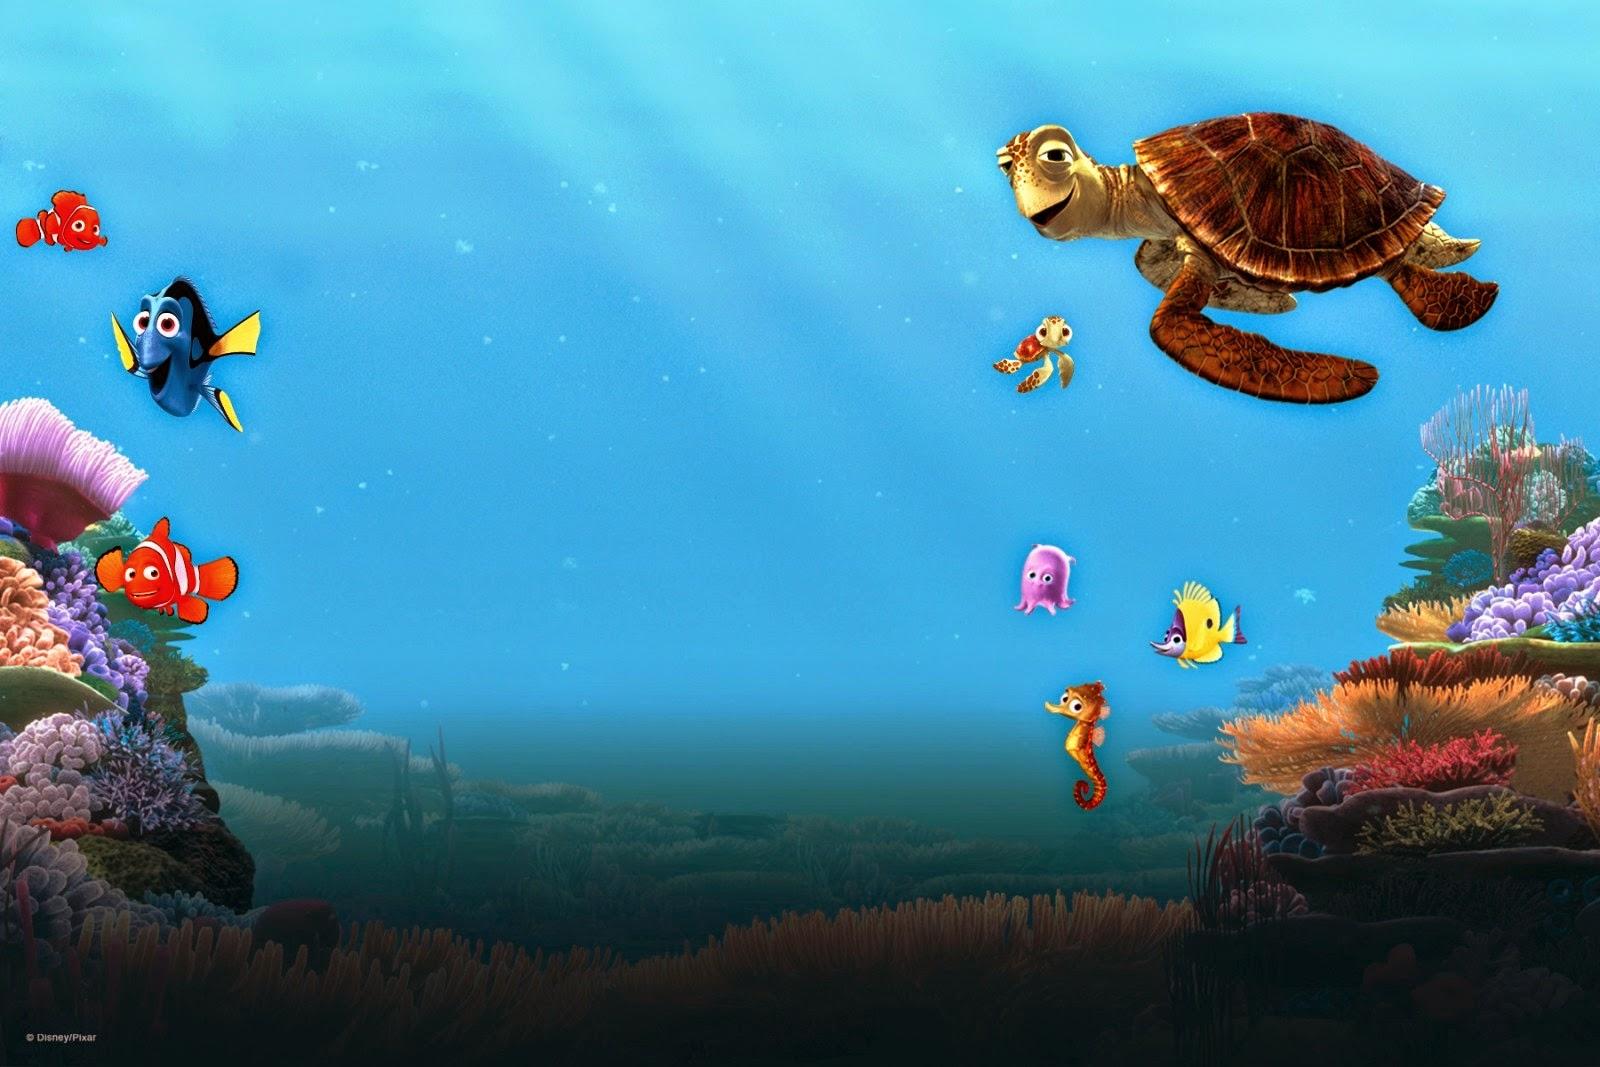 Finding Nemo D Animasi Hd Wallpaper: IPHONE: Finding Nemo Wallpaper